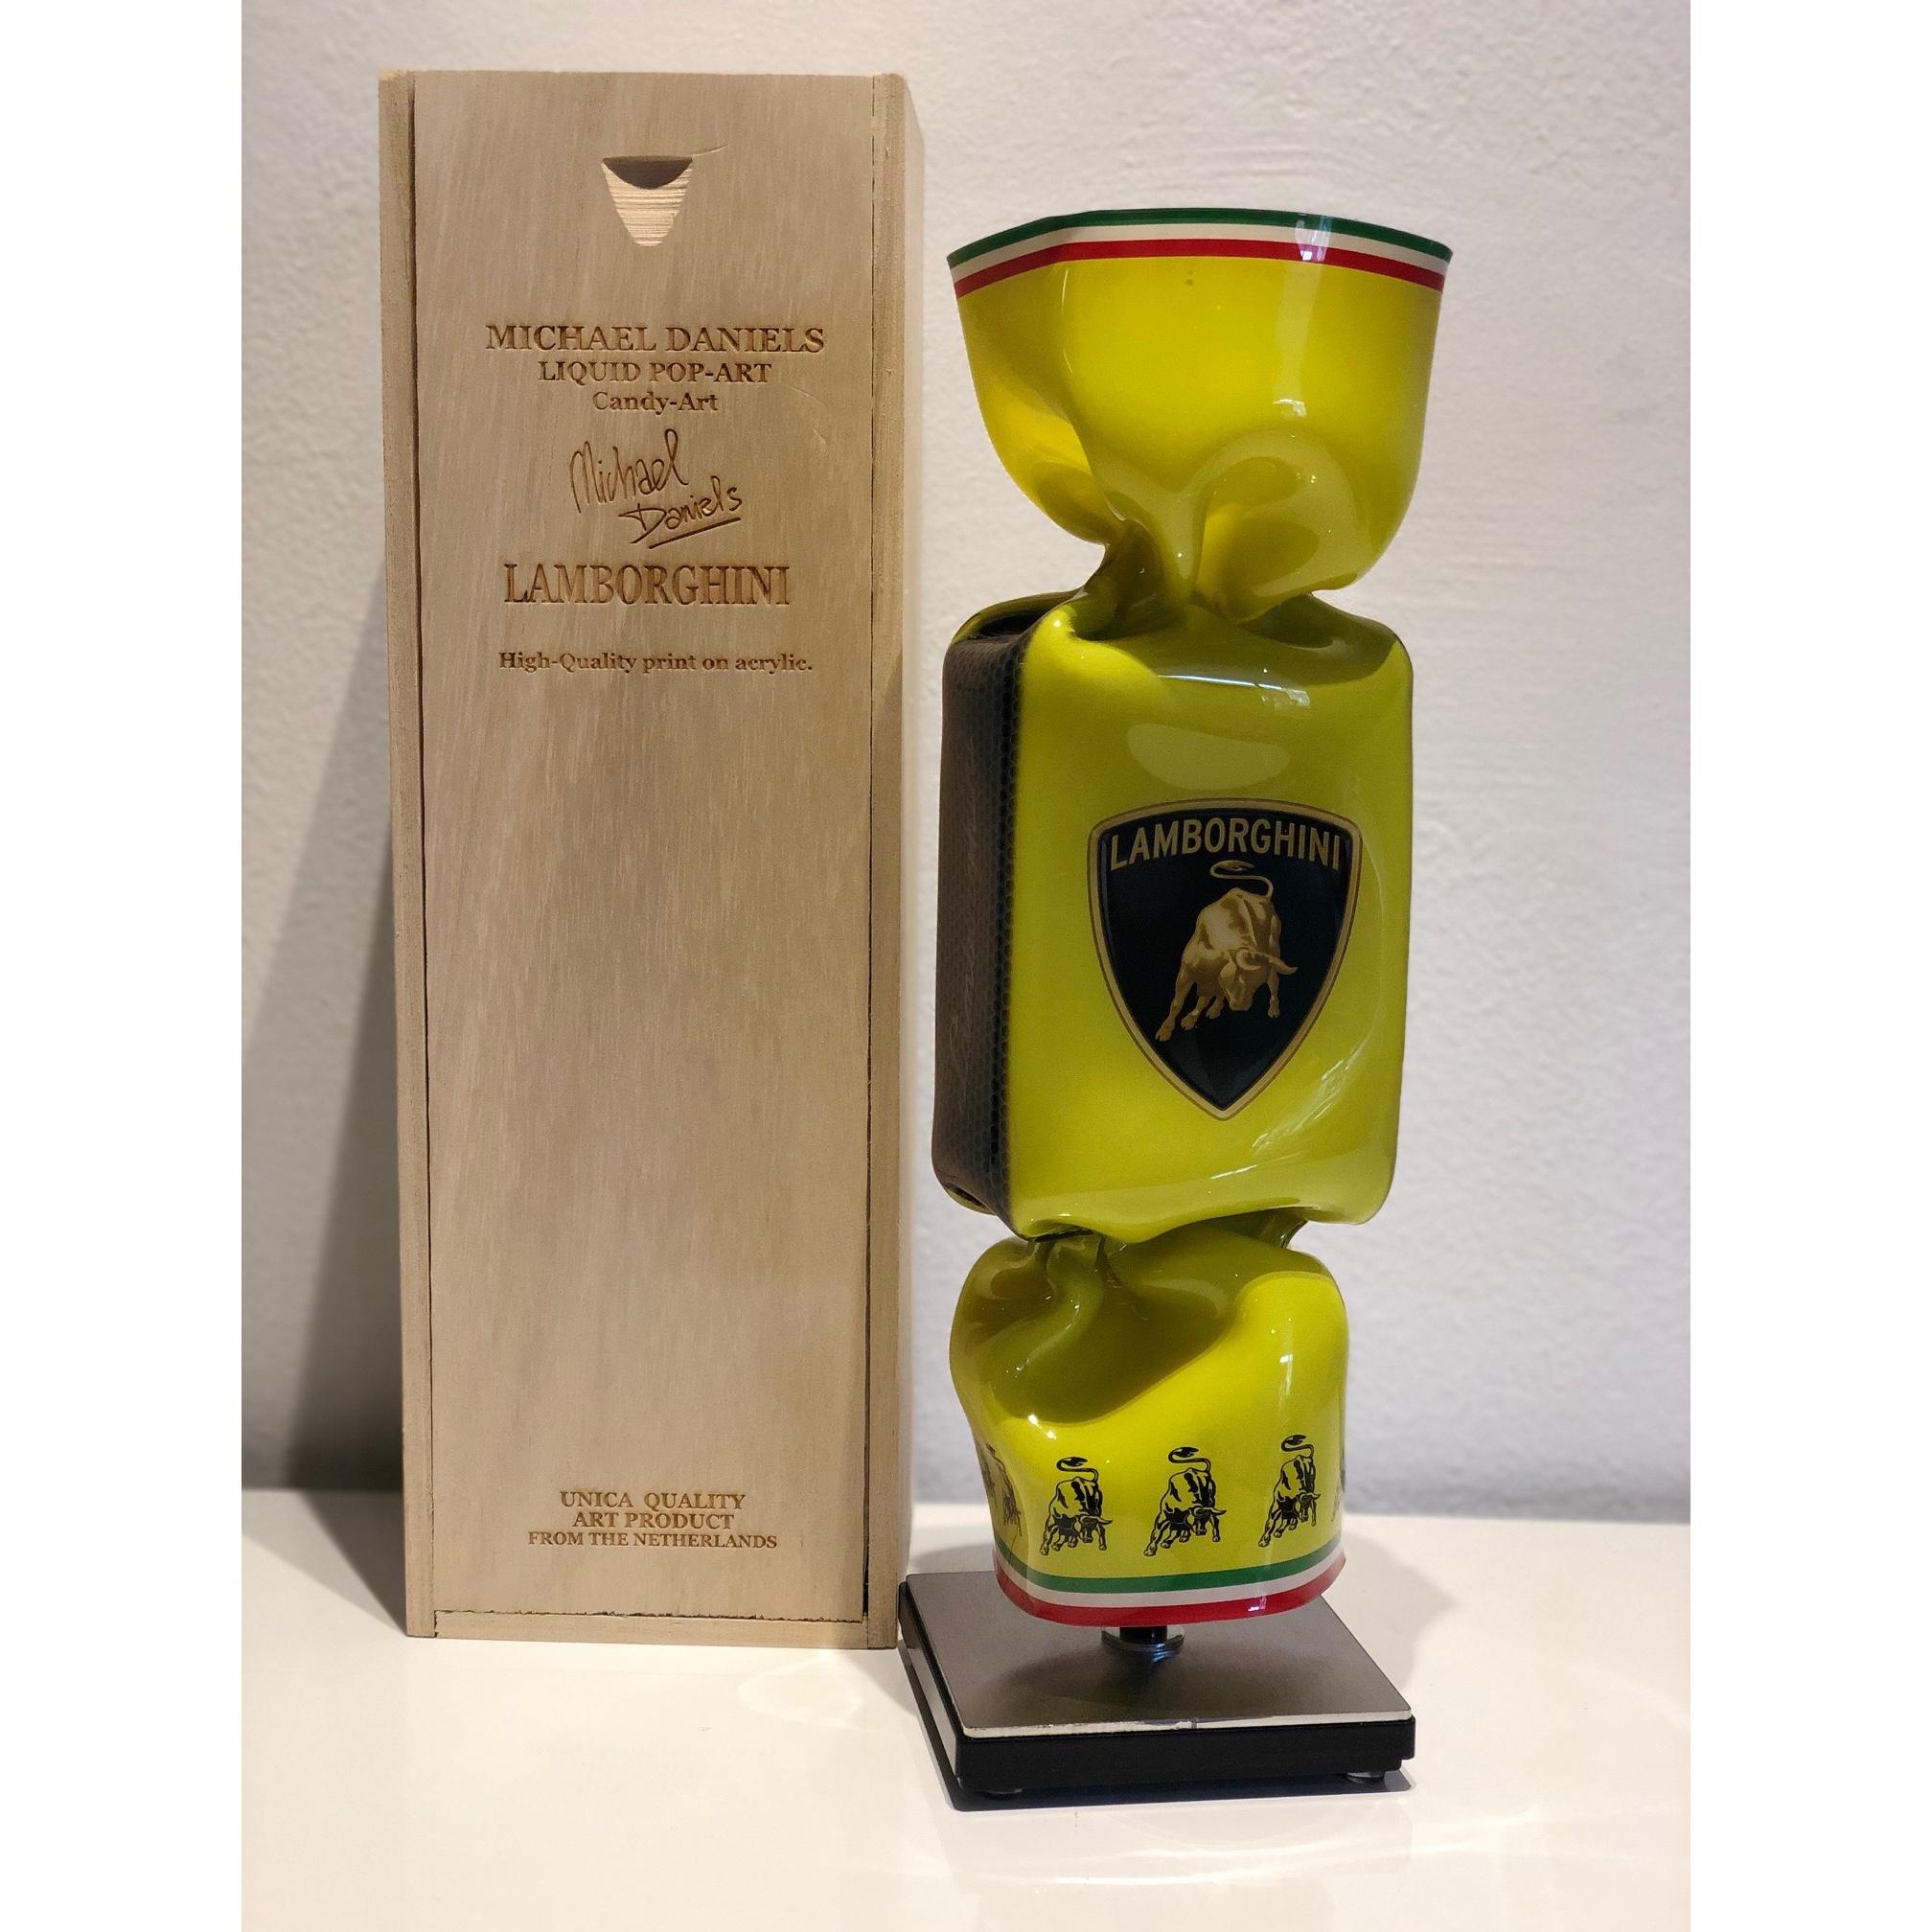 Michael Daniels Art Toffee 'Lamborghini Yellow'